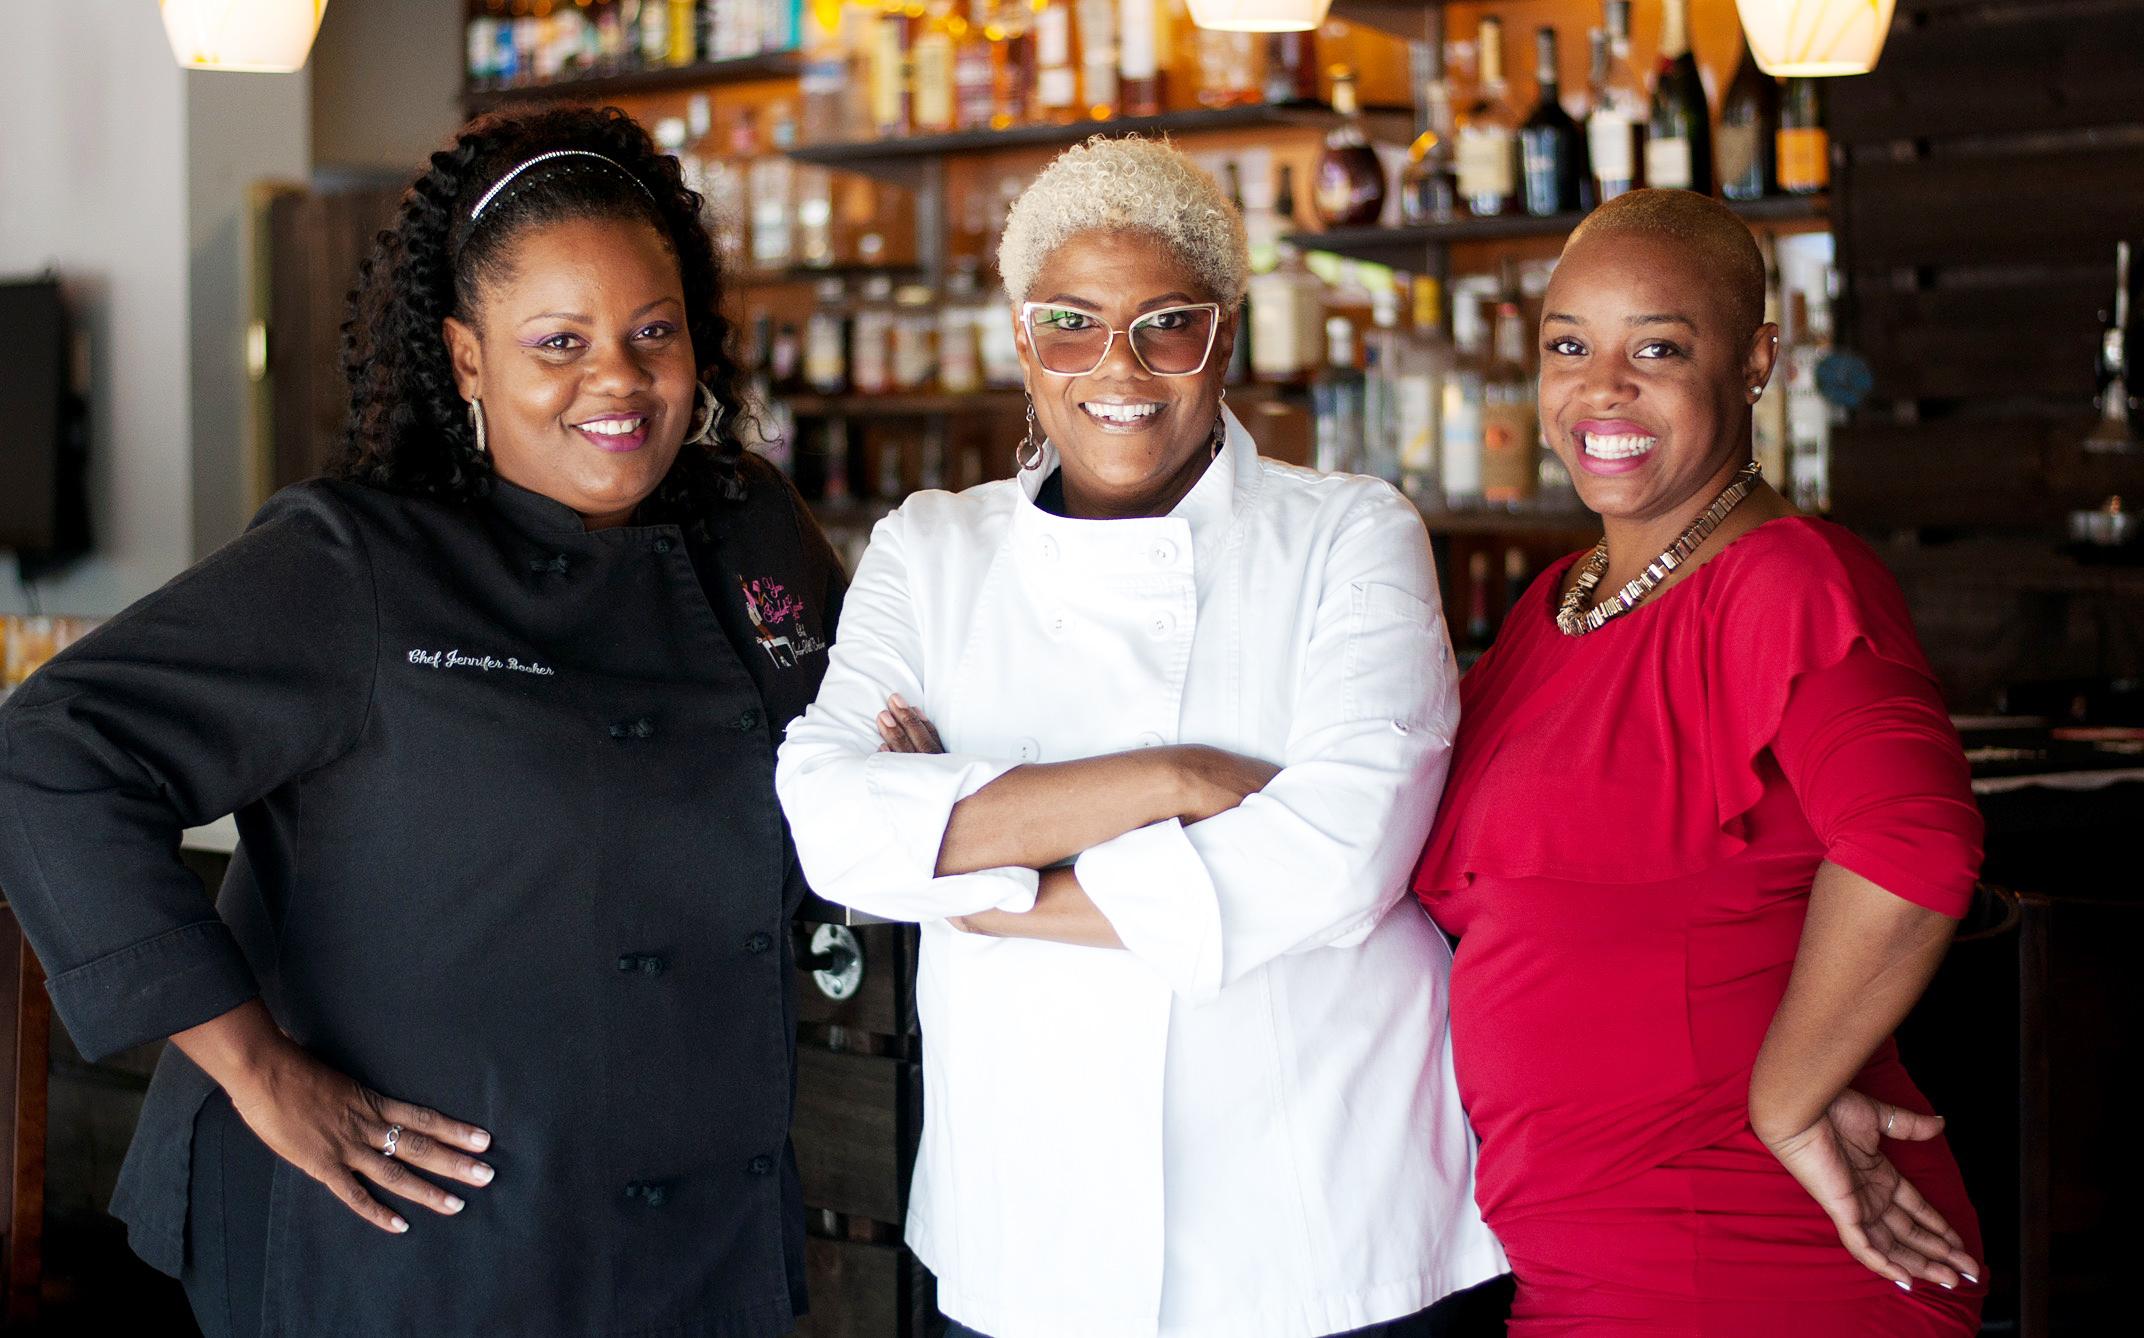 Image: Jennifer Booker, Deborah VanTrece, Tiffanie Barriere at Twisted Soul, VanTrece's restaurant in Atlanta.